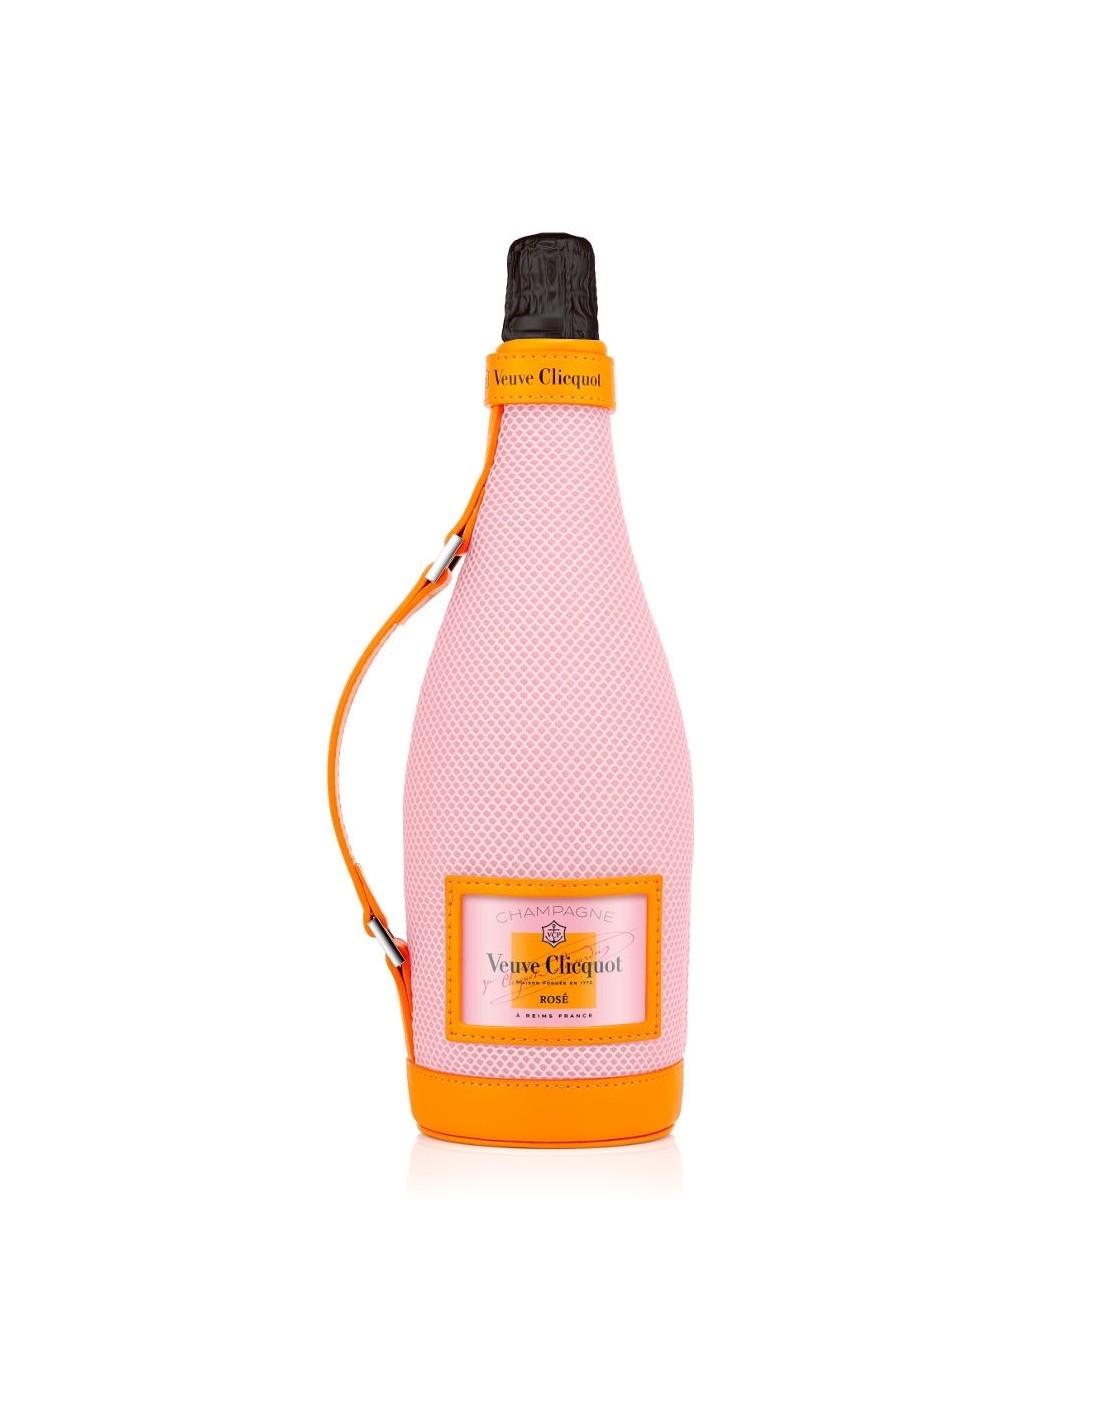 Sampanie roze, Veuve Clicquot Ice Jacket Champagne, 0.75L, 12% alc., Franta